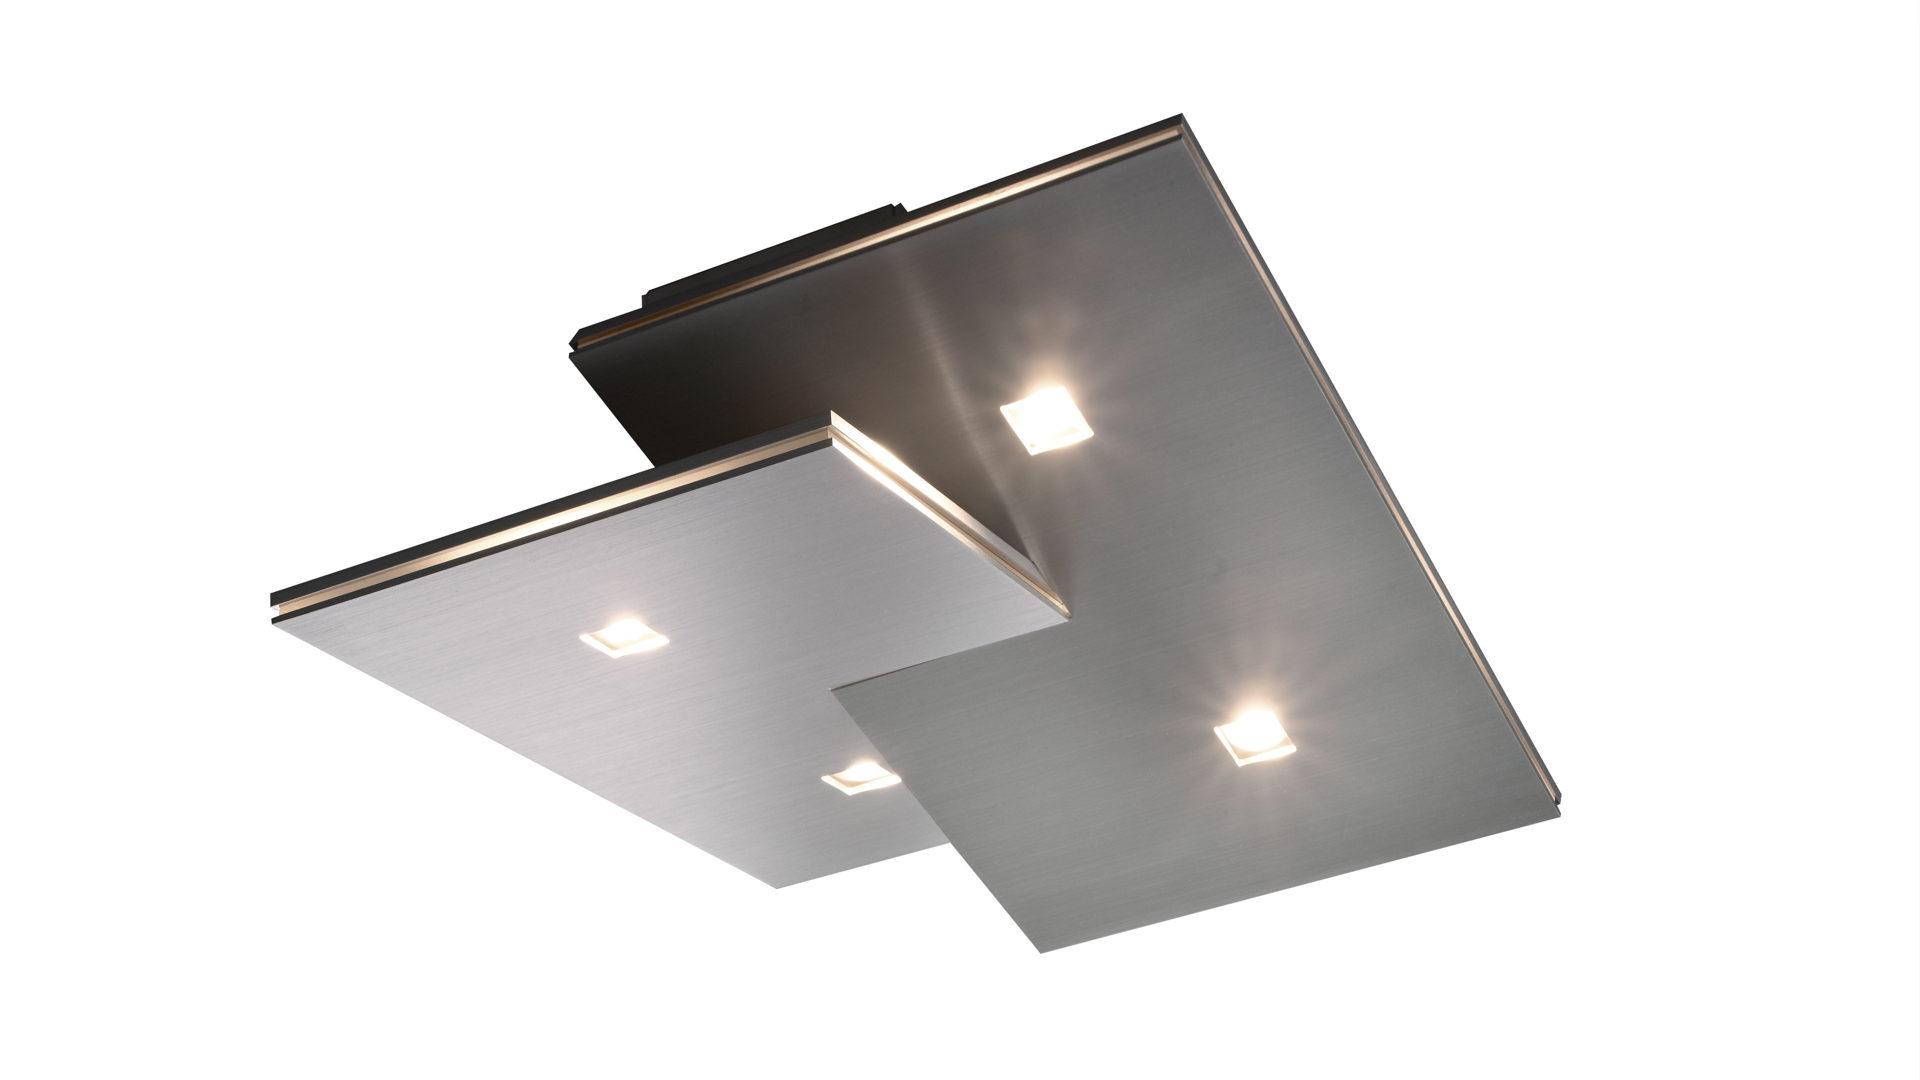 BOPP LED-Deckenleuchte Extra, geschliffenes Aluminium - ca. 30 x 30 ...